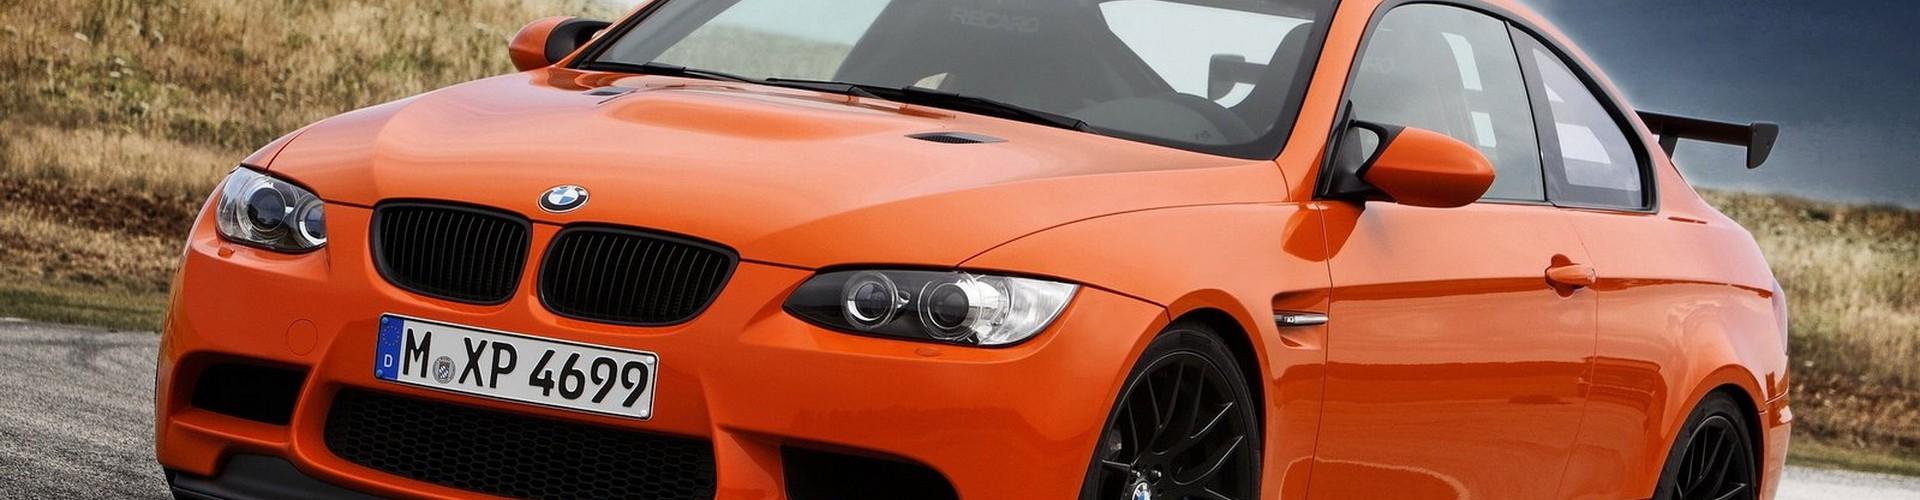 stage de pilotage importation de voitures de sport allemandes. Black Bedroom Furniture Sets. Home Design Ideas